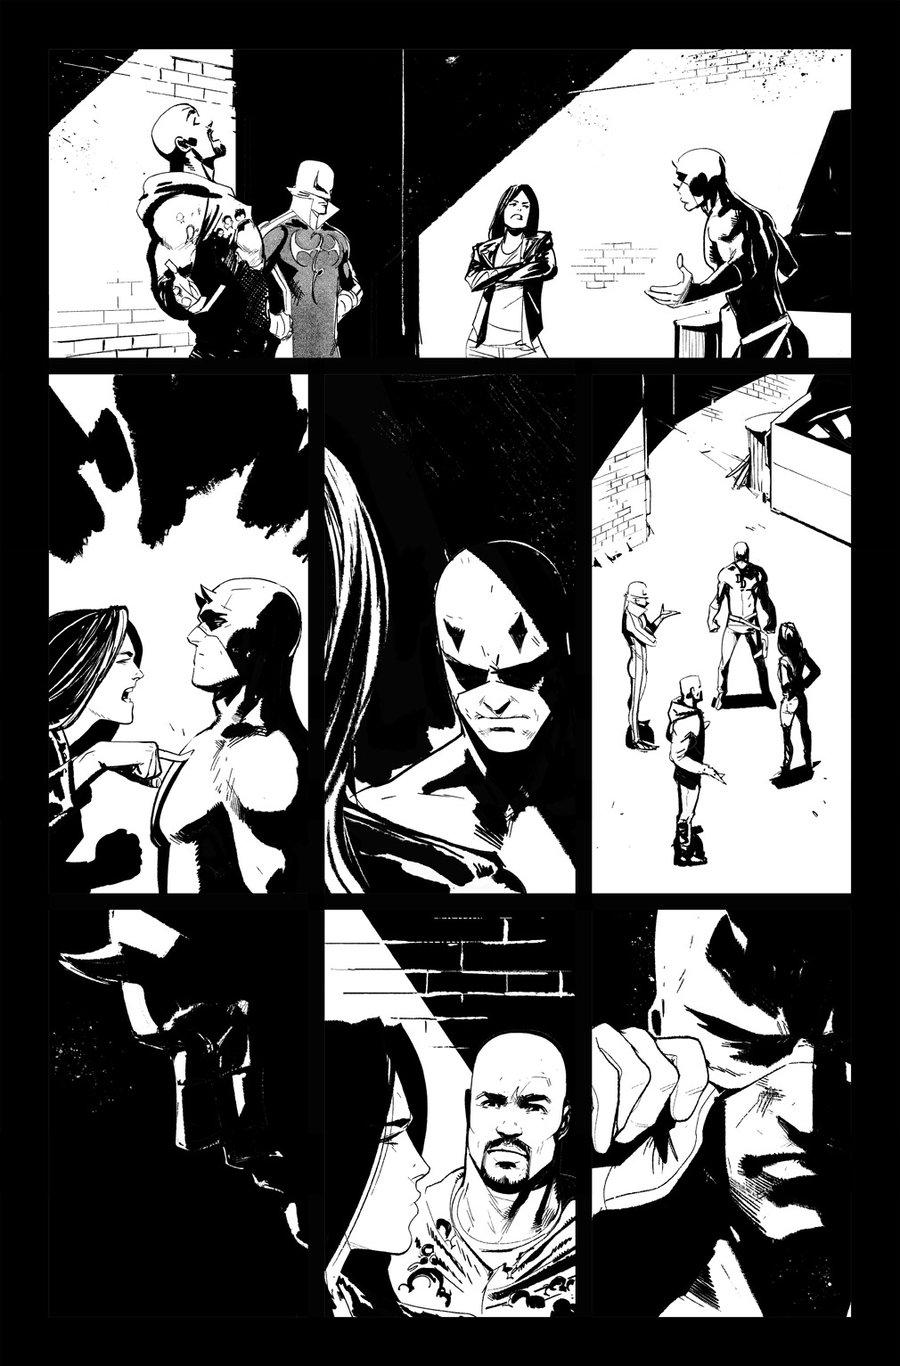 Image of DEFENDERS #8, p.16 ARTIST'S PROOF